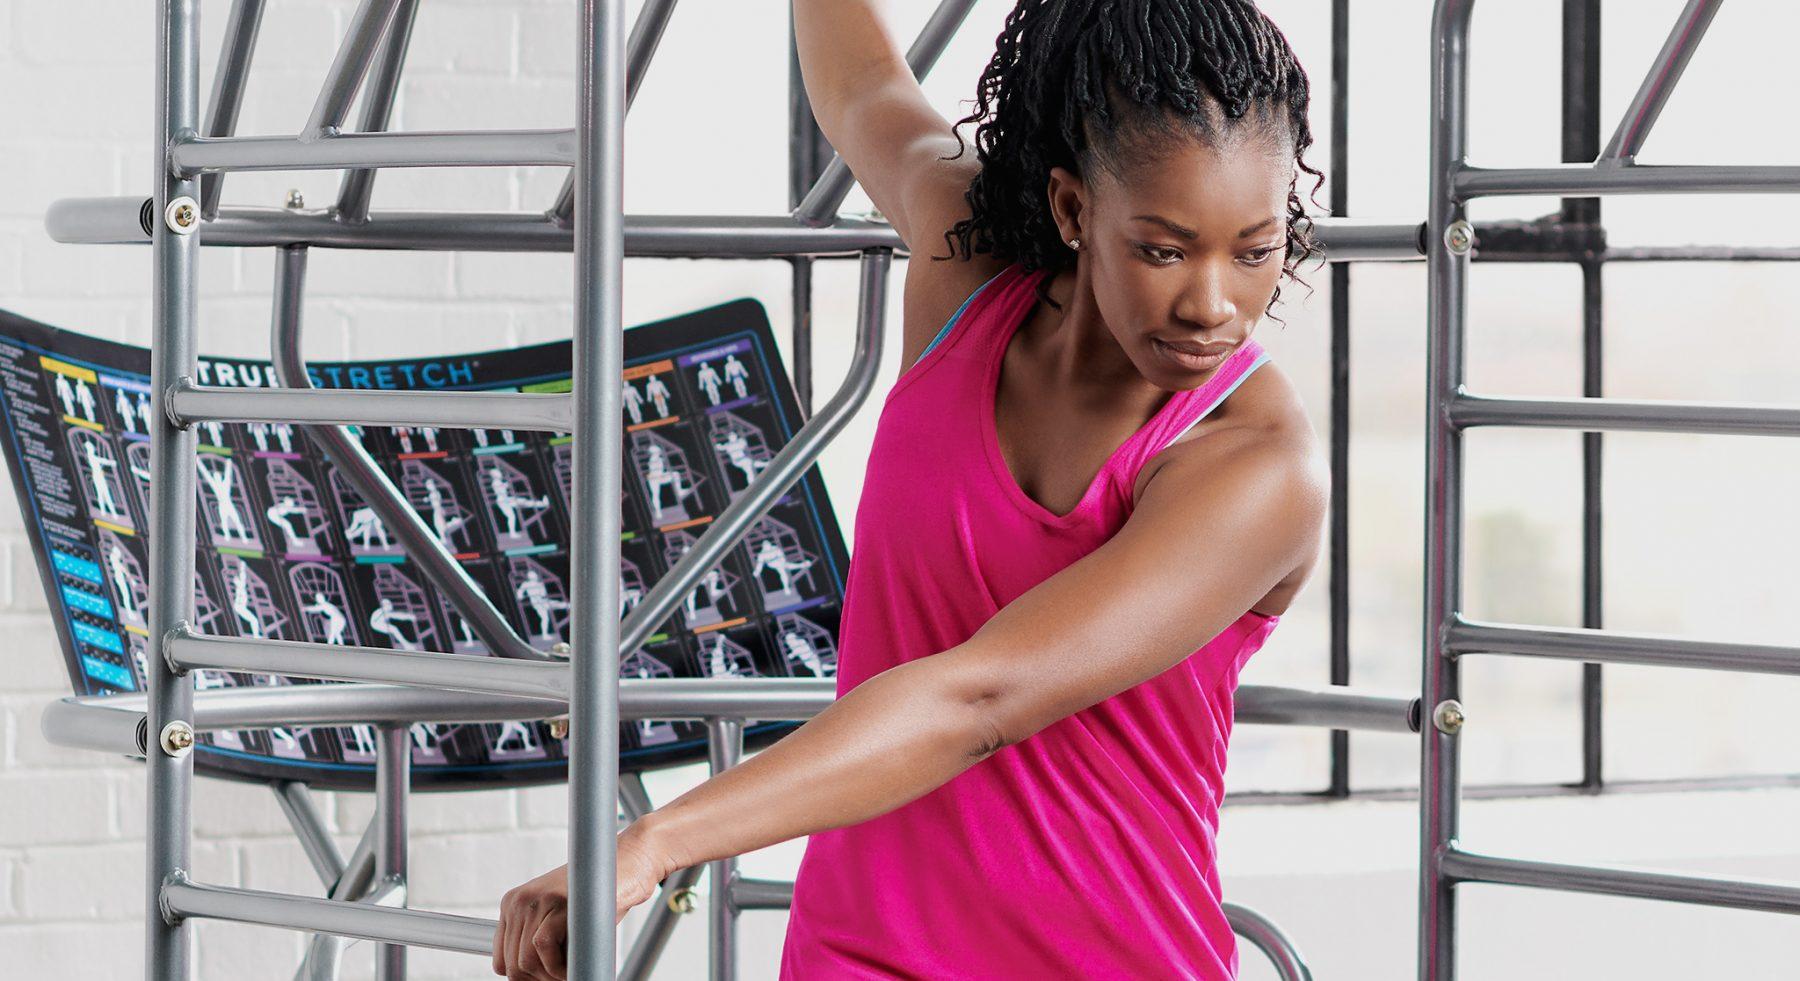 TRUE Fitness flexibility equipment.